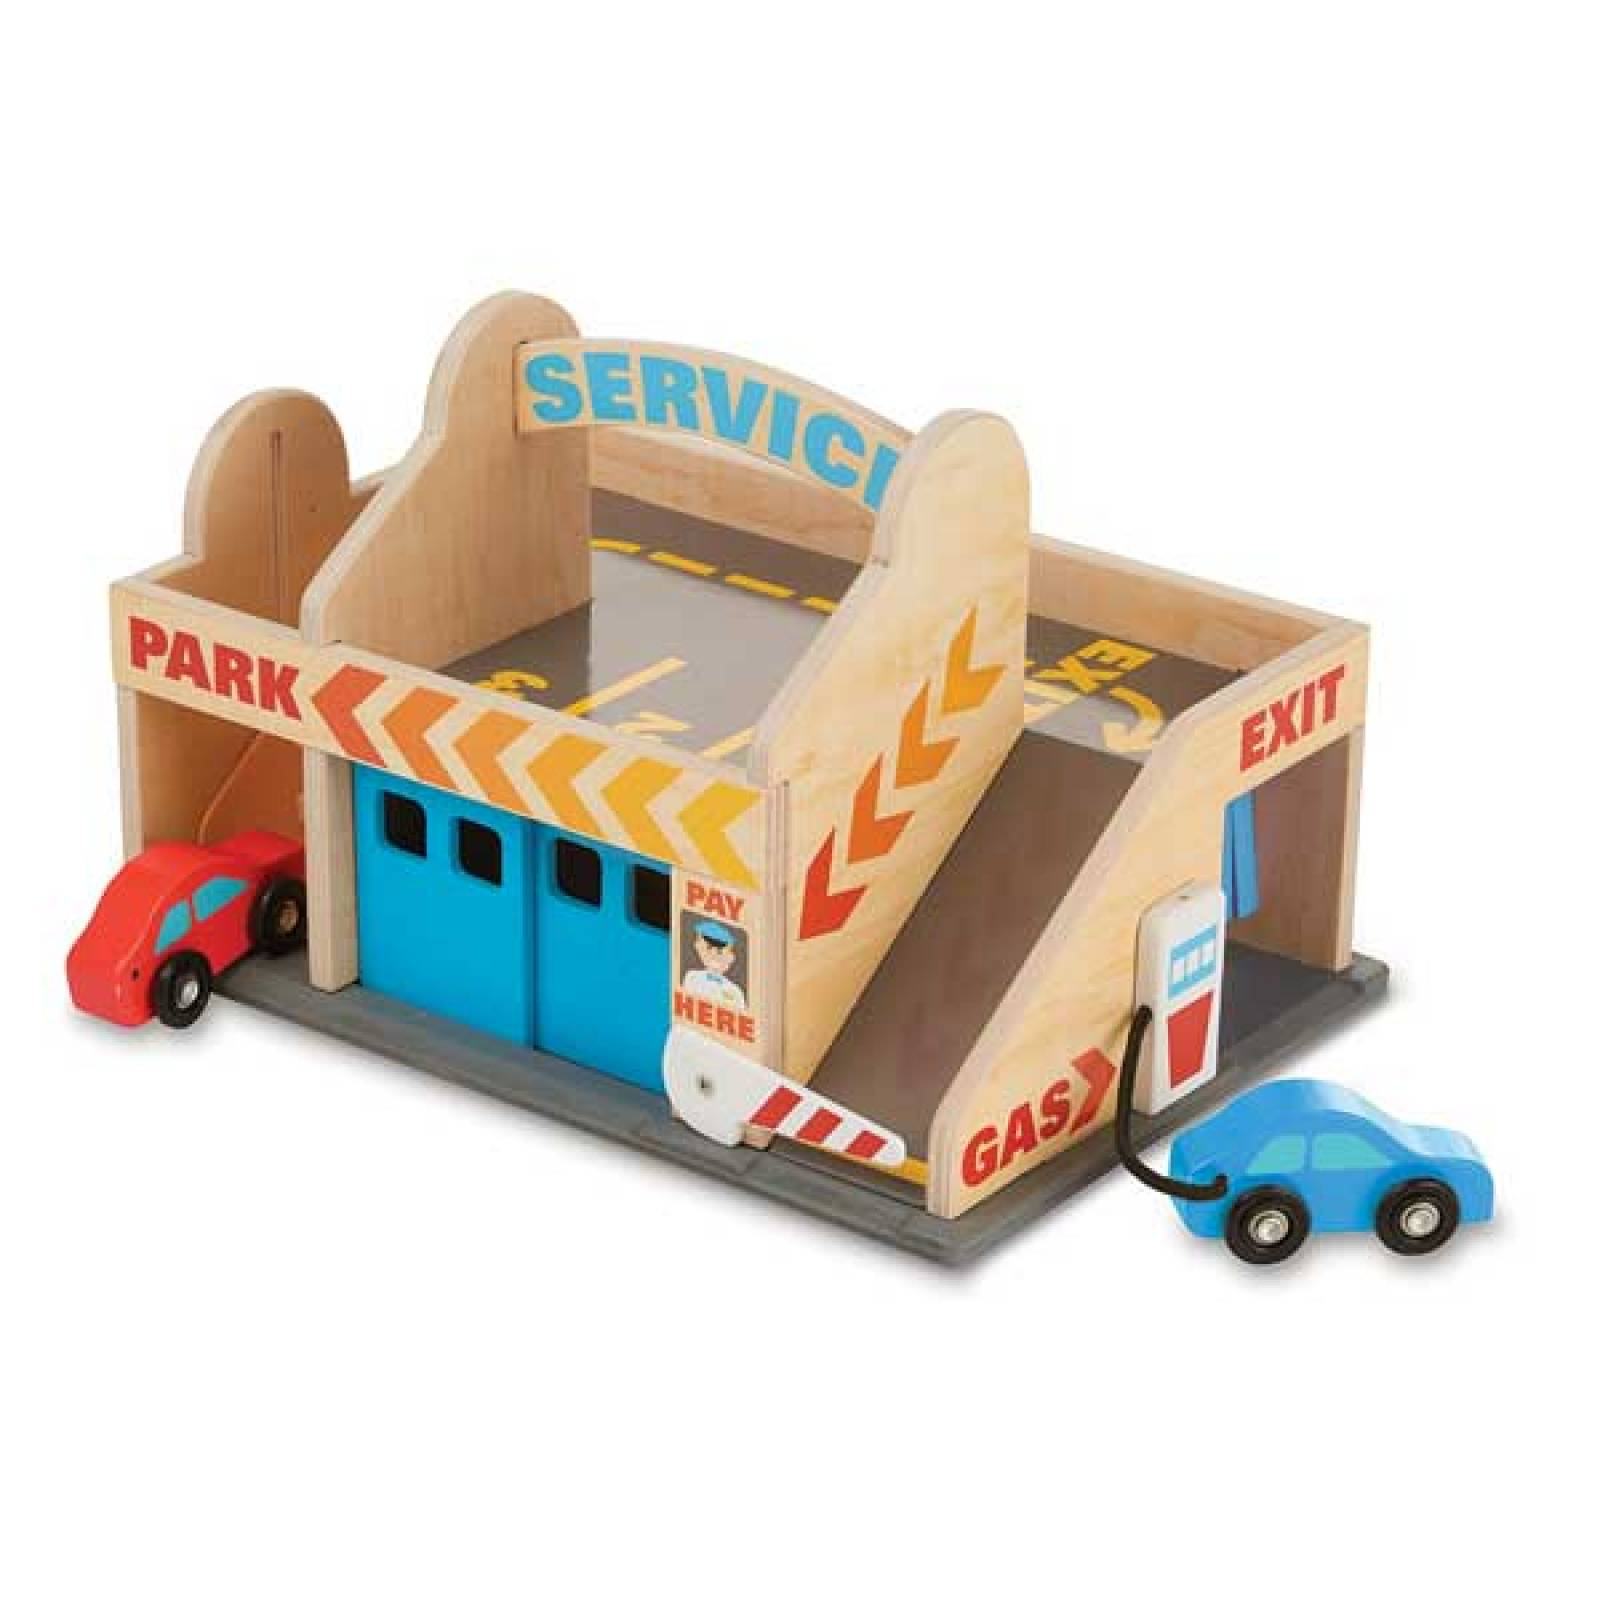 Service Station Parking Garage Toy By Melissa & Doug 3+